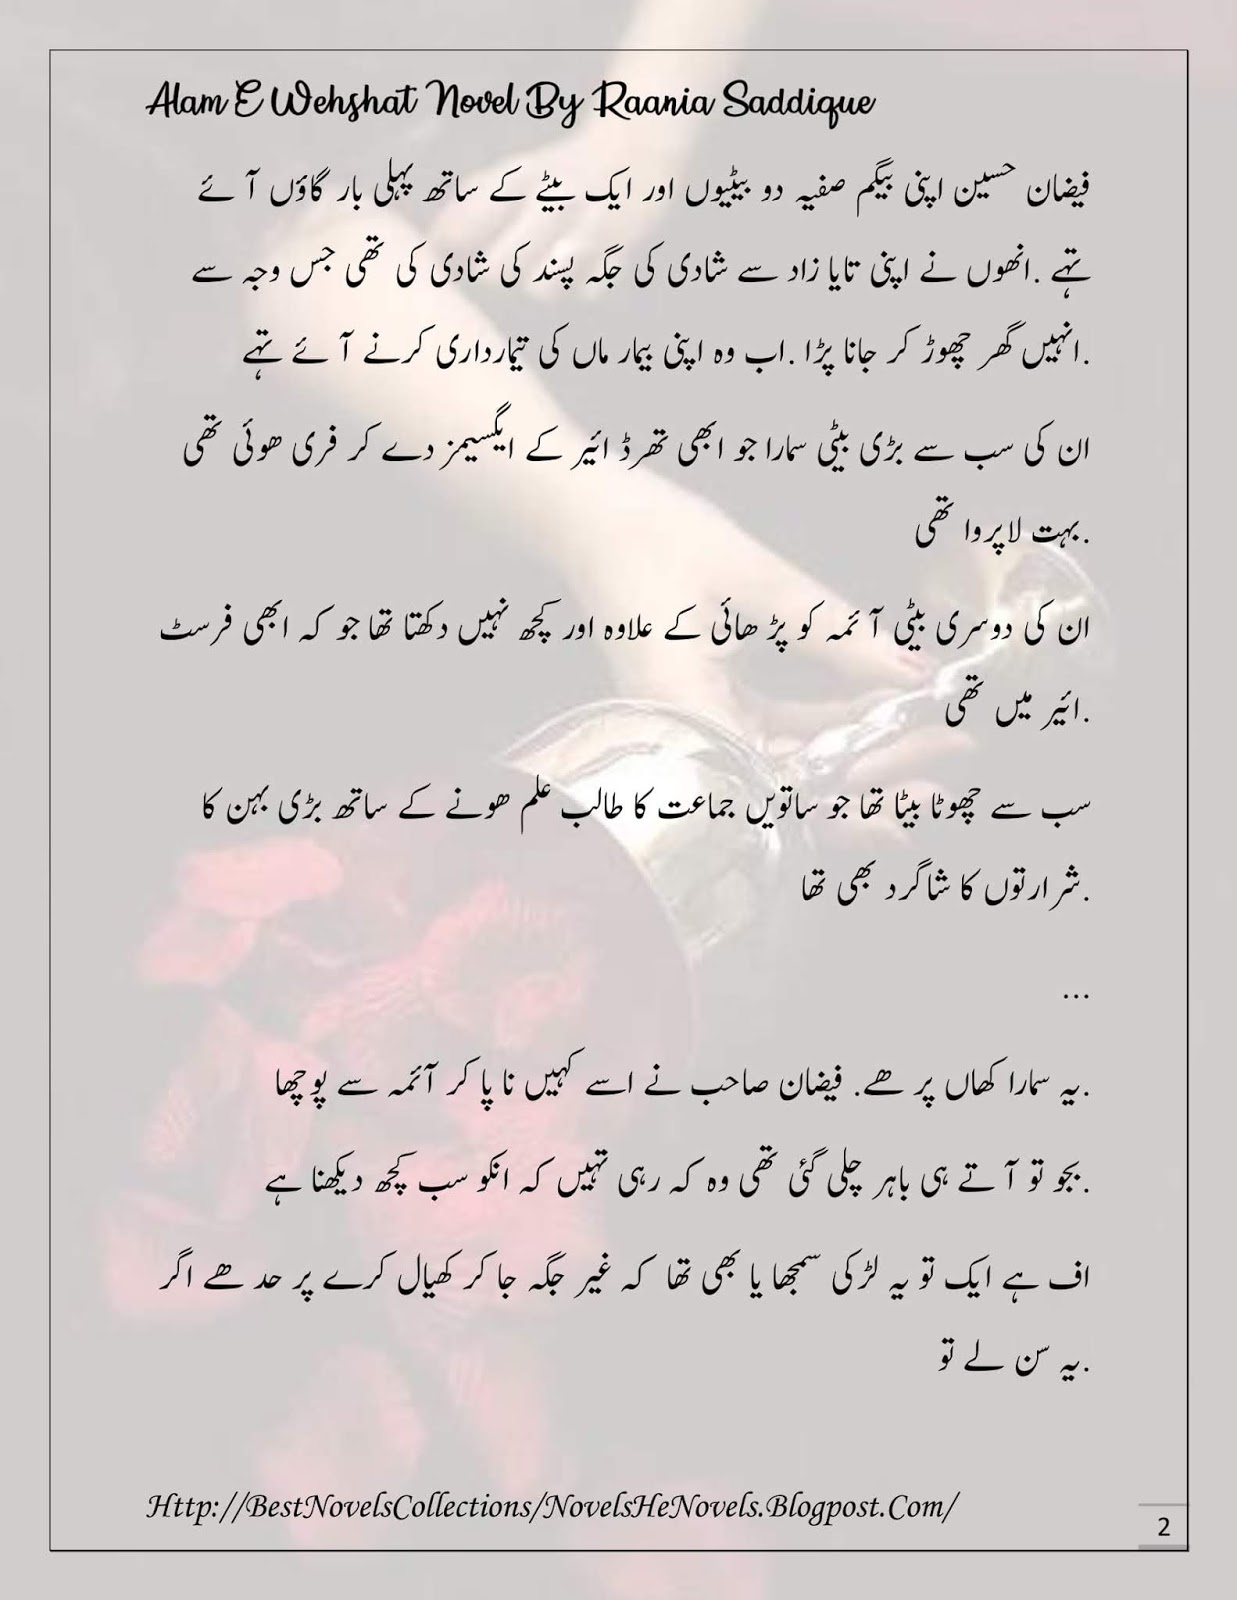 Alam E Wehshat by Raania Saddique Rude And Cruel Hero Novel